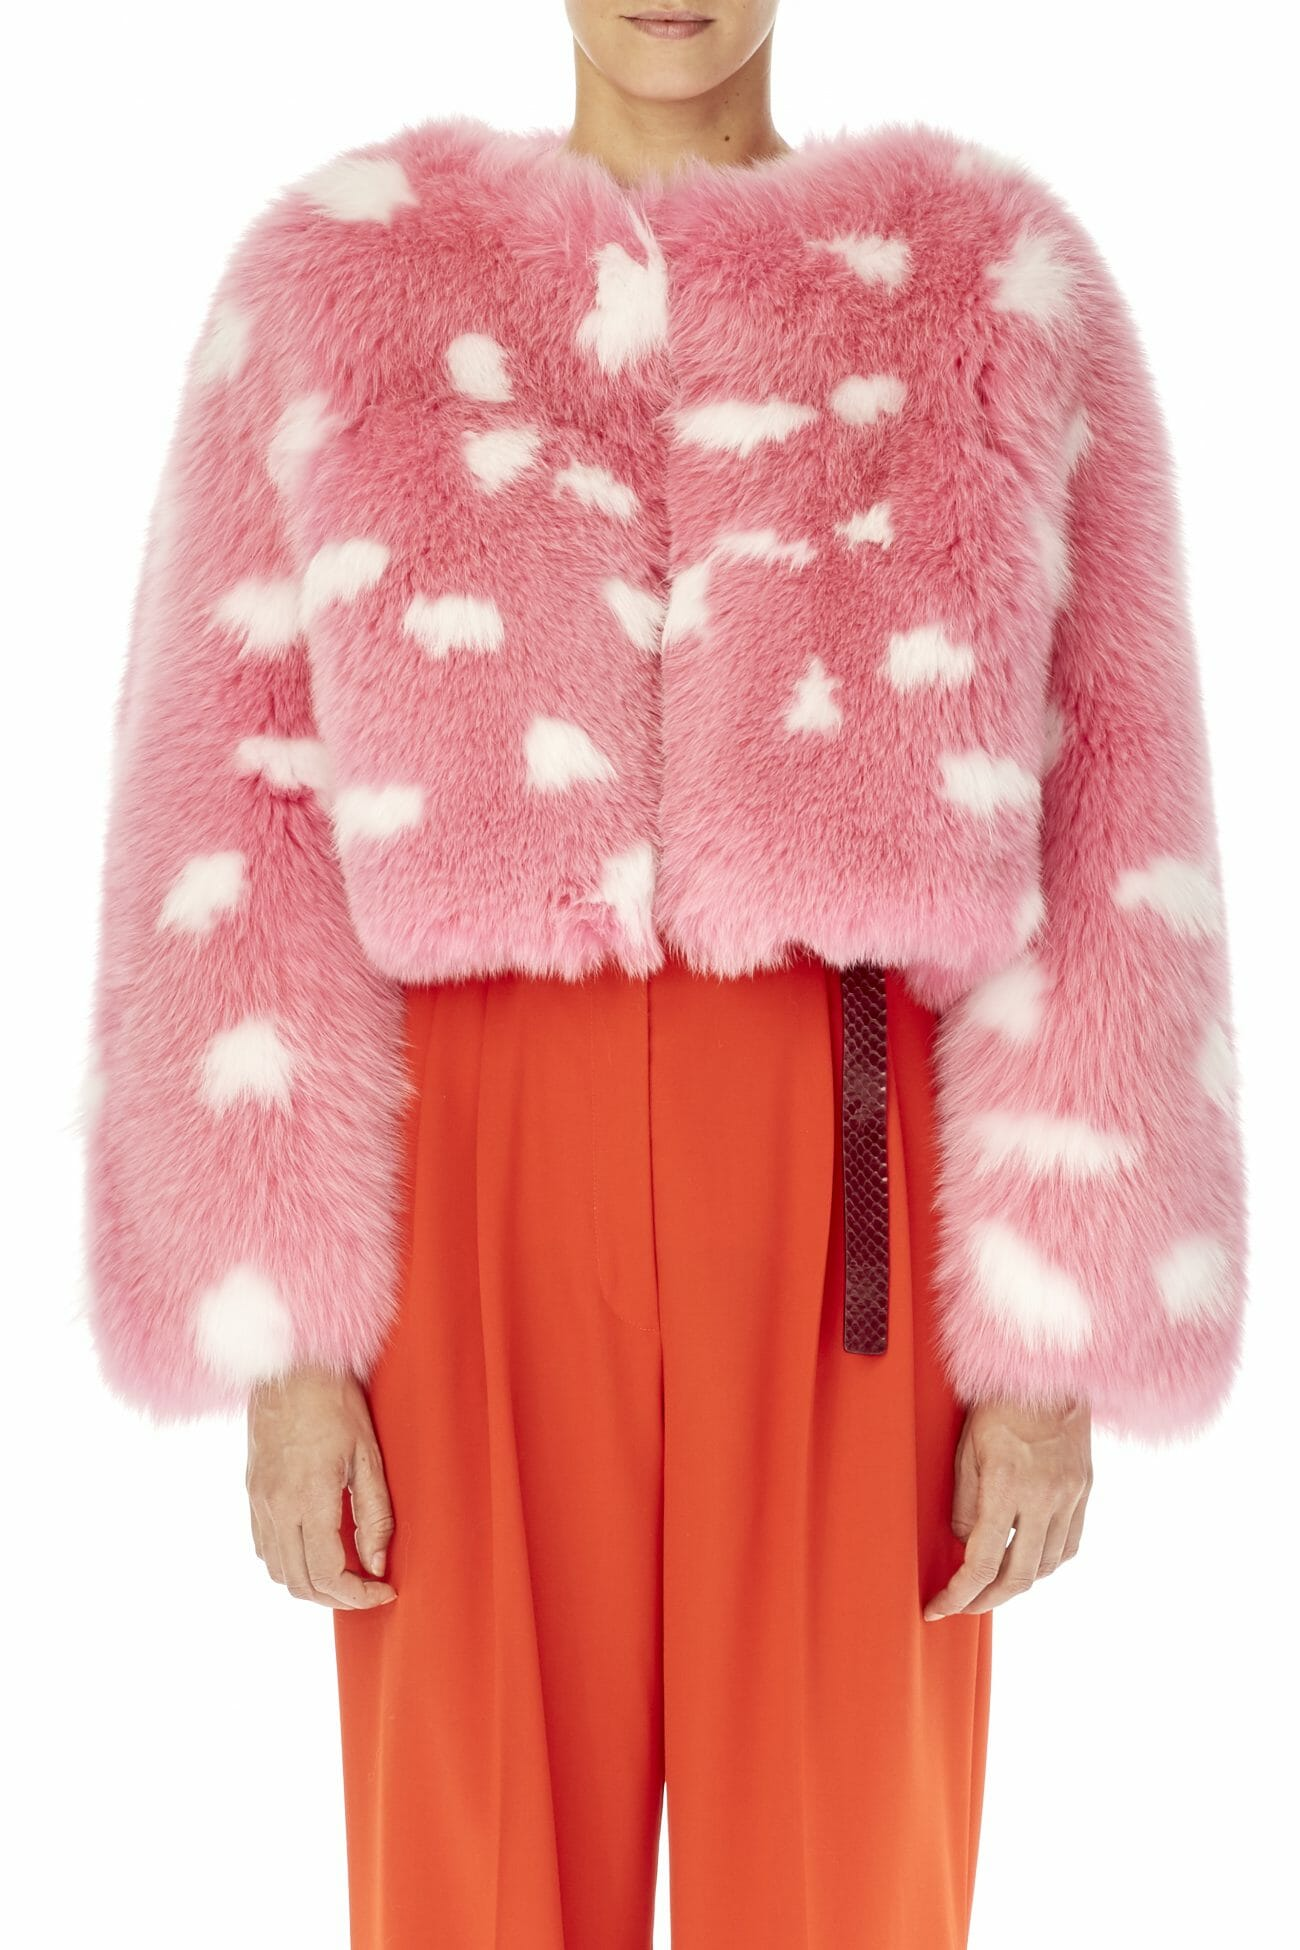 Carolina-Herrera-New-York-Resort-2019-look-151-fur-pink-white-coat